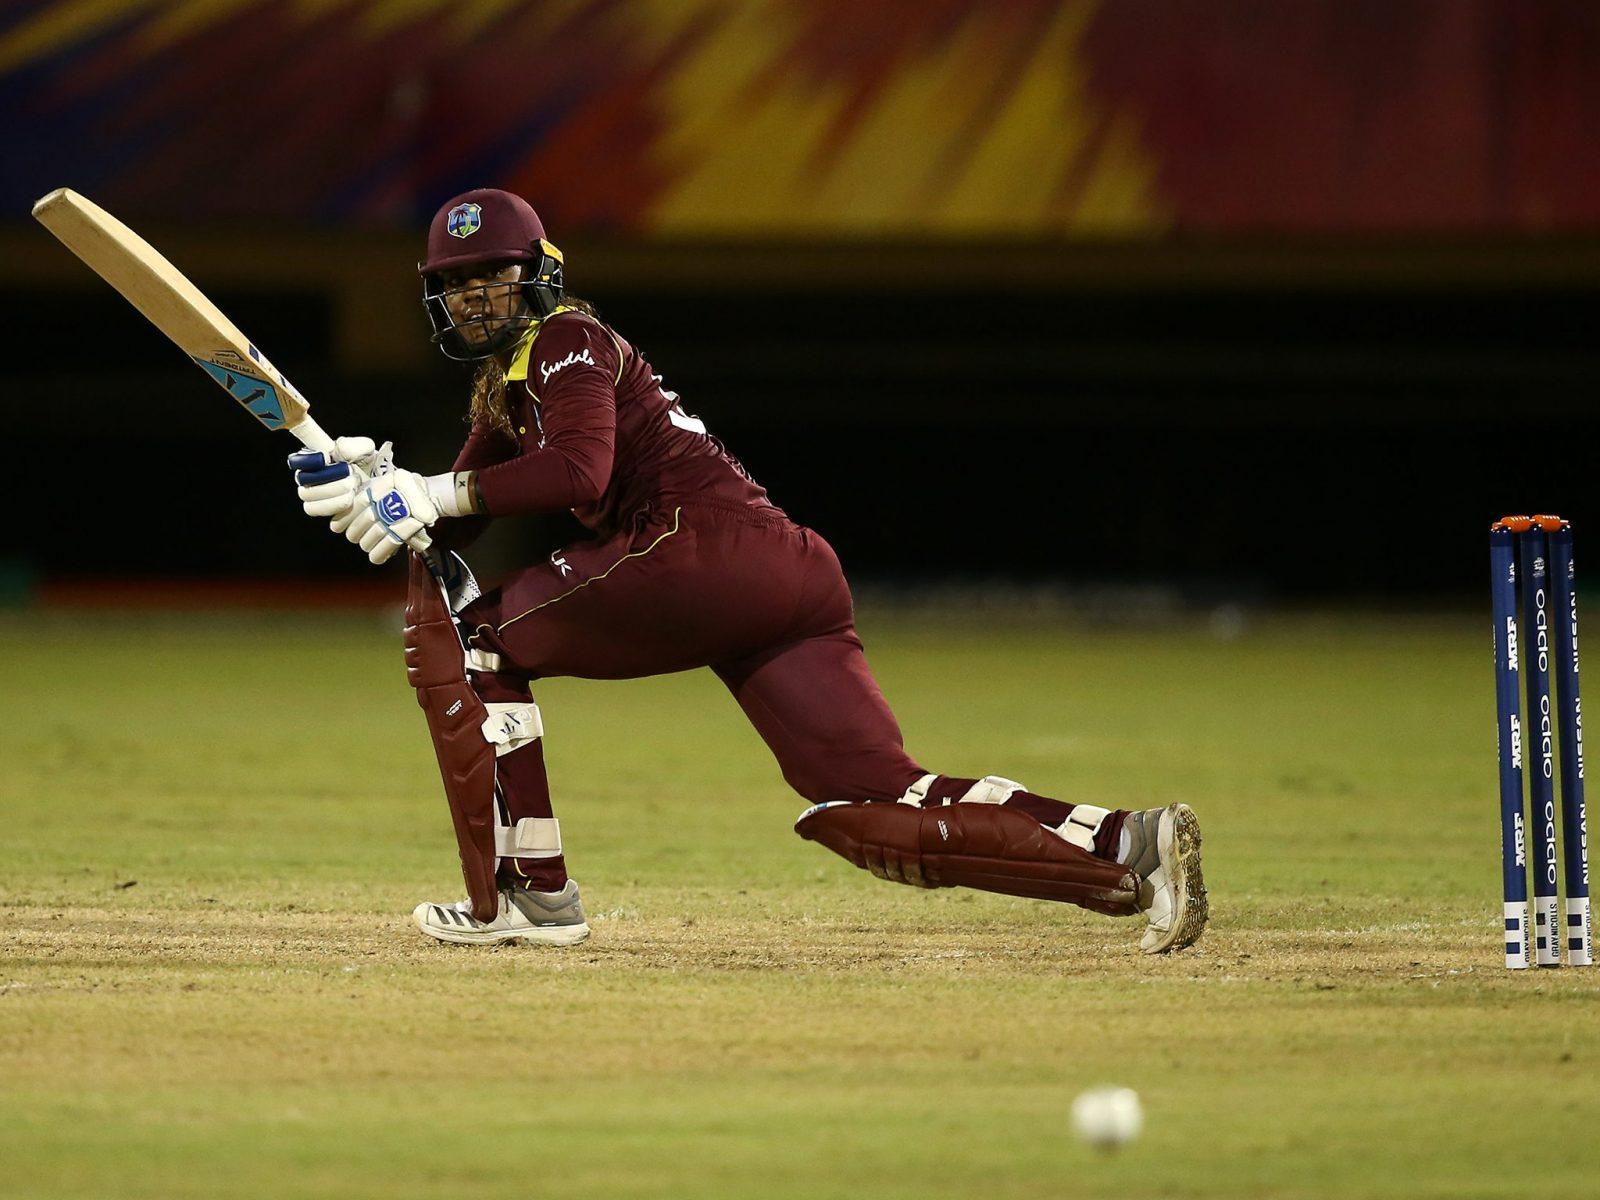 ICC Women's T20 World Cup - West Indies v Qualifier 2, Perth, Western Australia